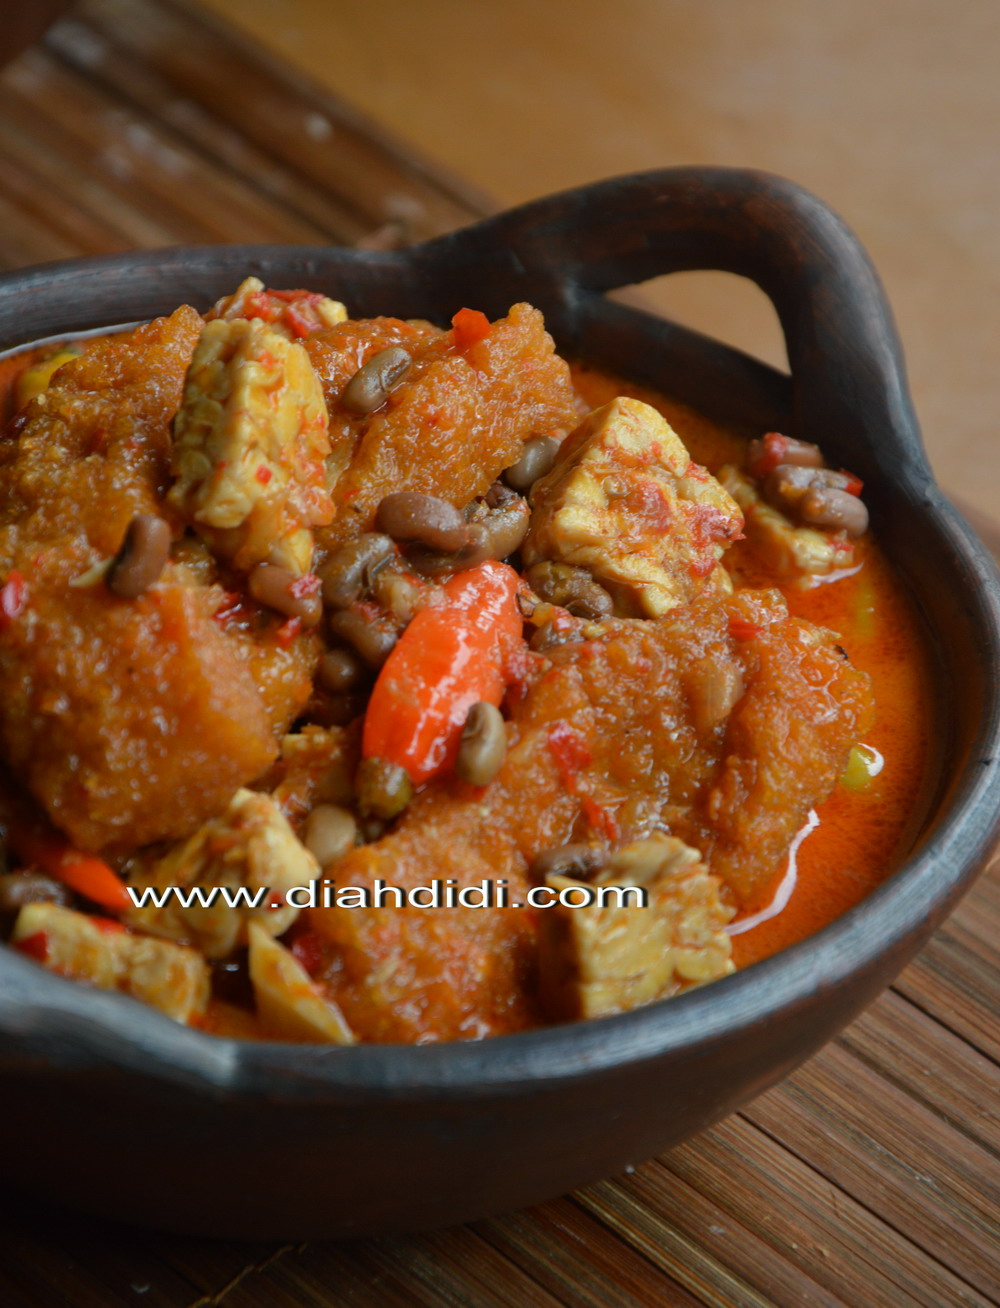 Diah Didi's Kitchen: Gudeg Yogya... Buatan Sendiri